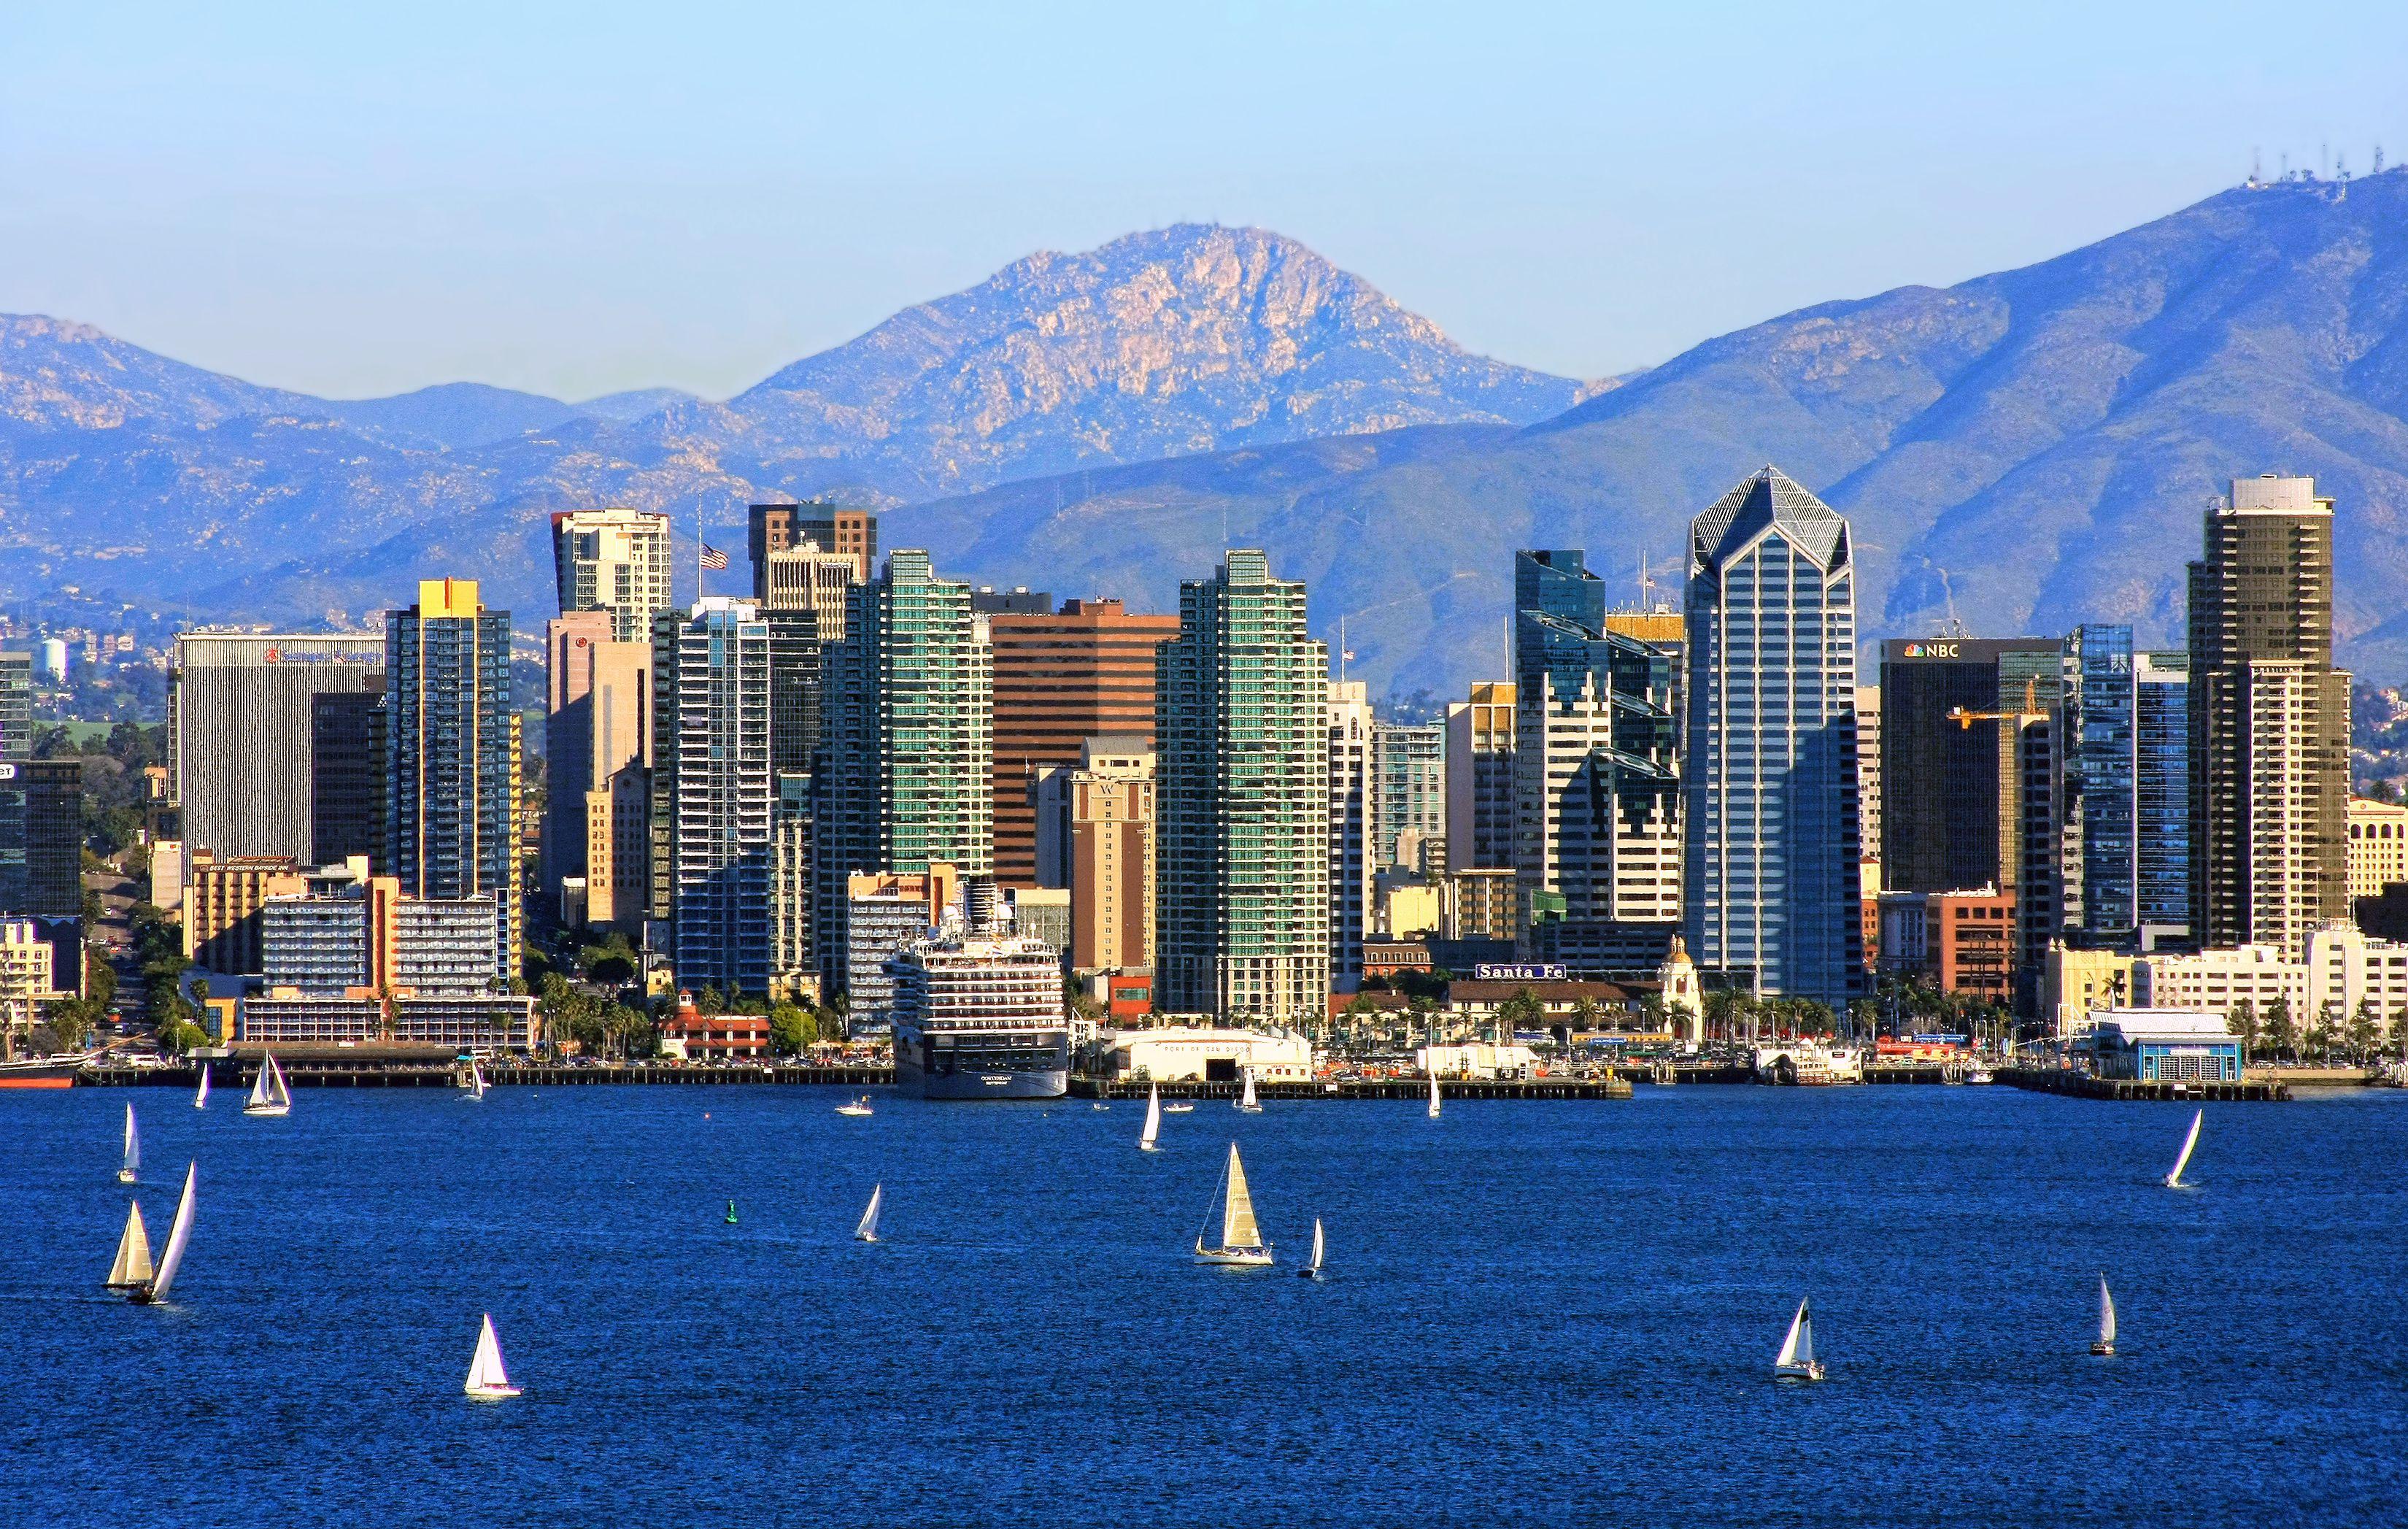 Weekend Getaways in California: 69 Trips You Can Take